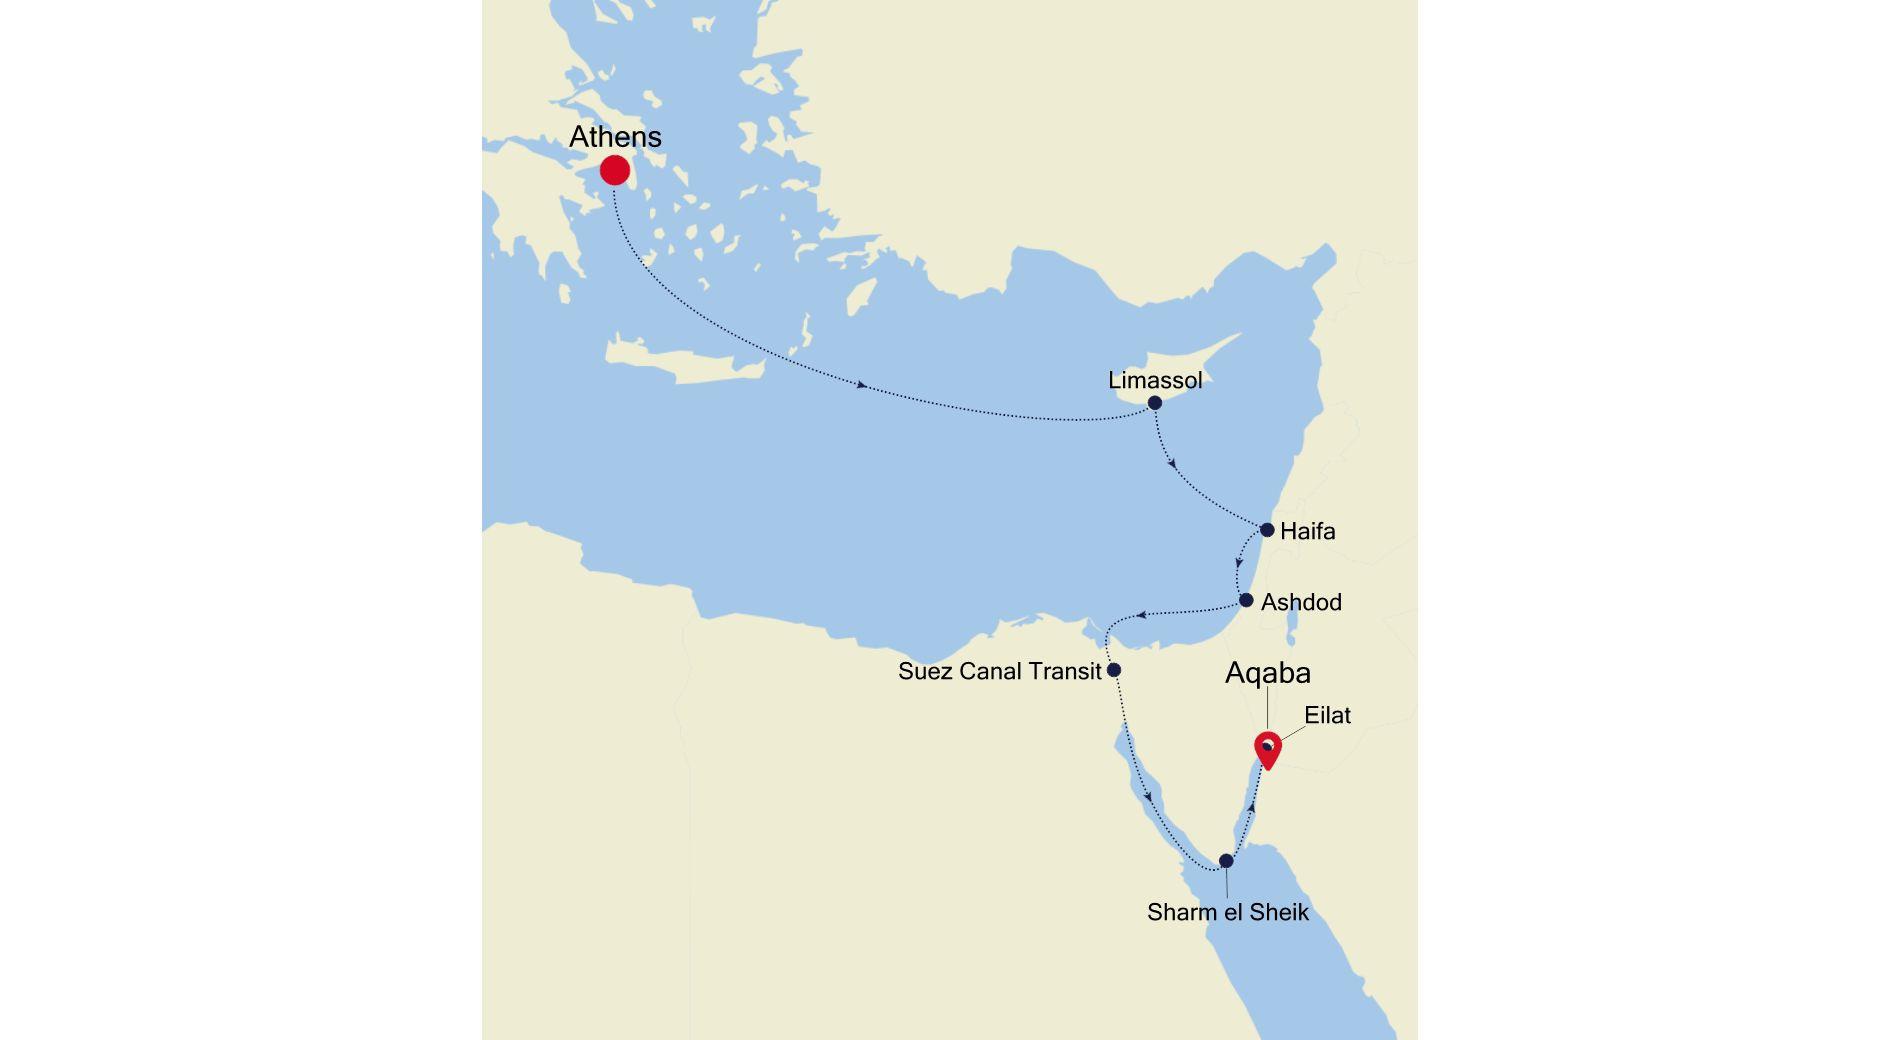 SS211124010 - Athens nach Aqaba